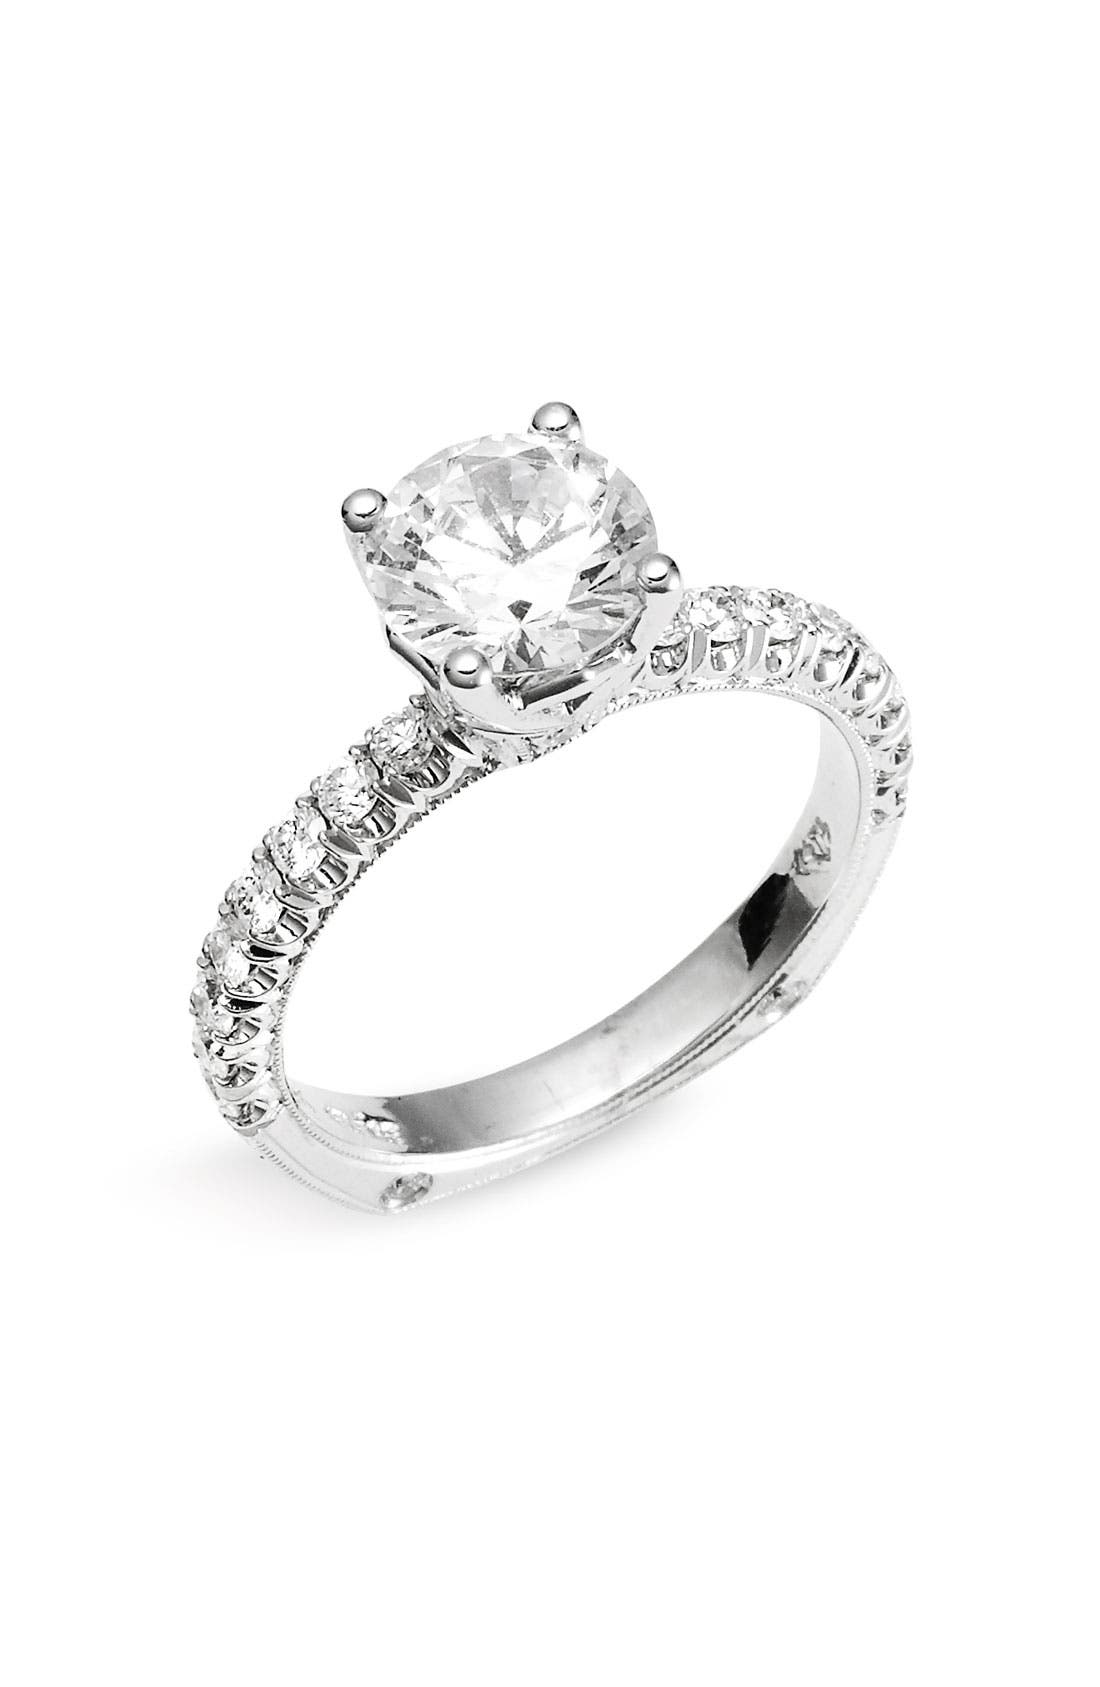 Alternate Image 1 Selected - Jack Kelége 'Romance' Diamond Engagement Ring Setting